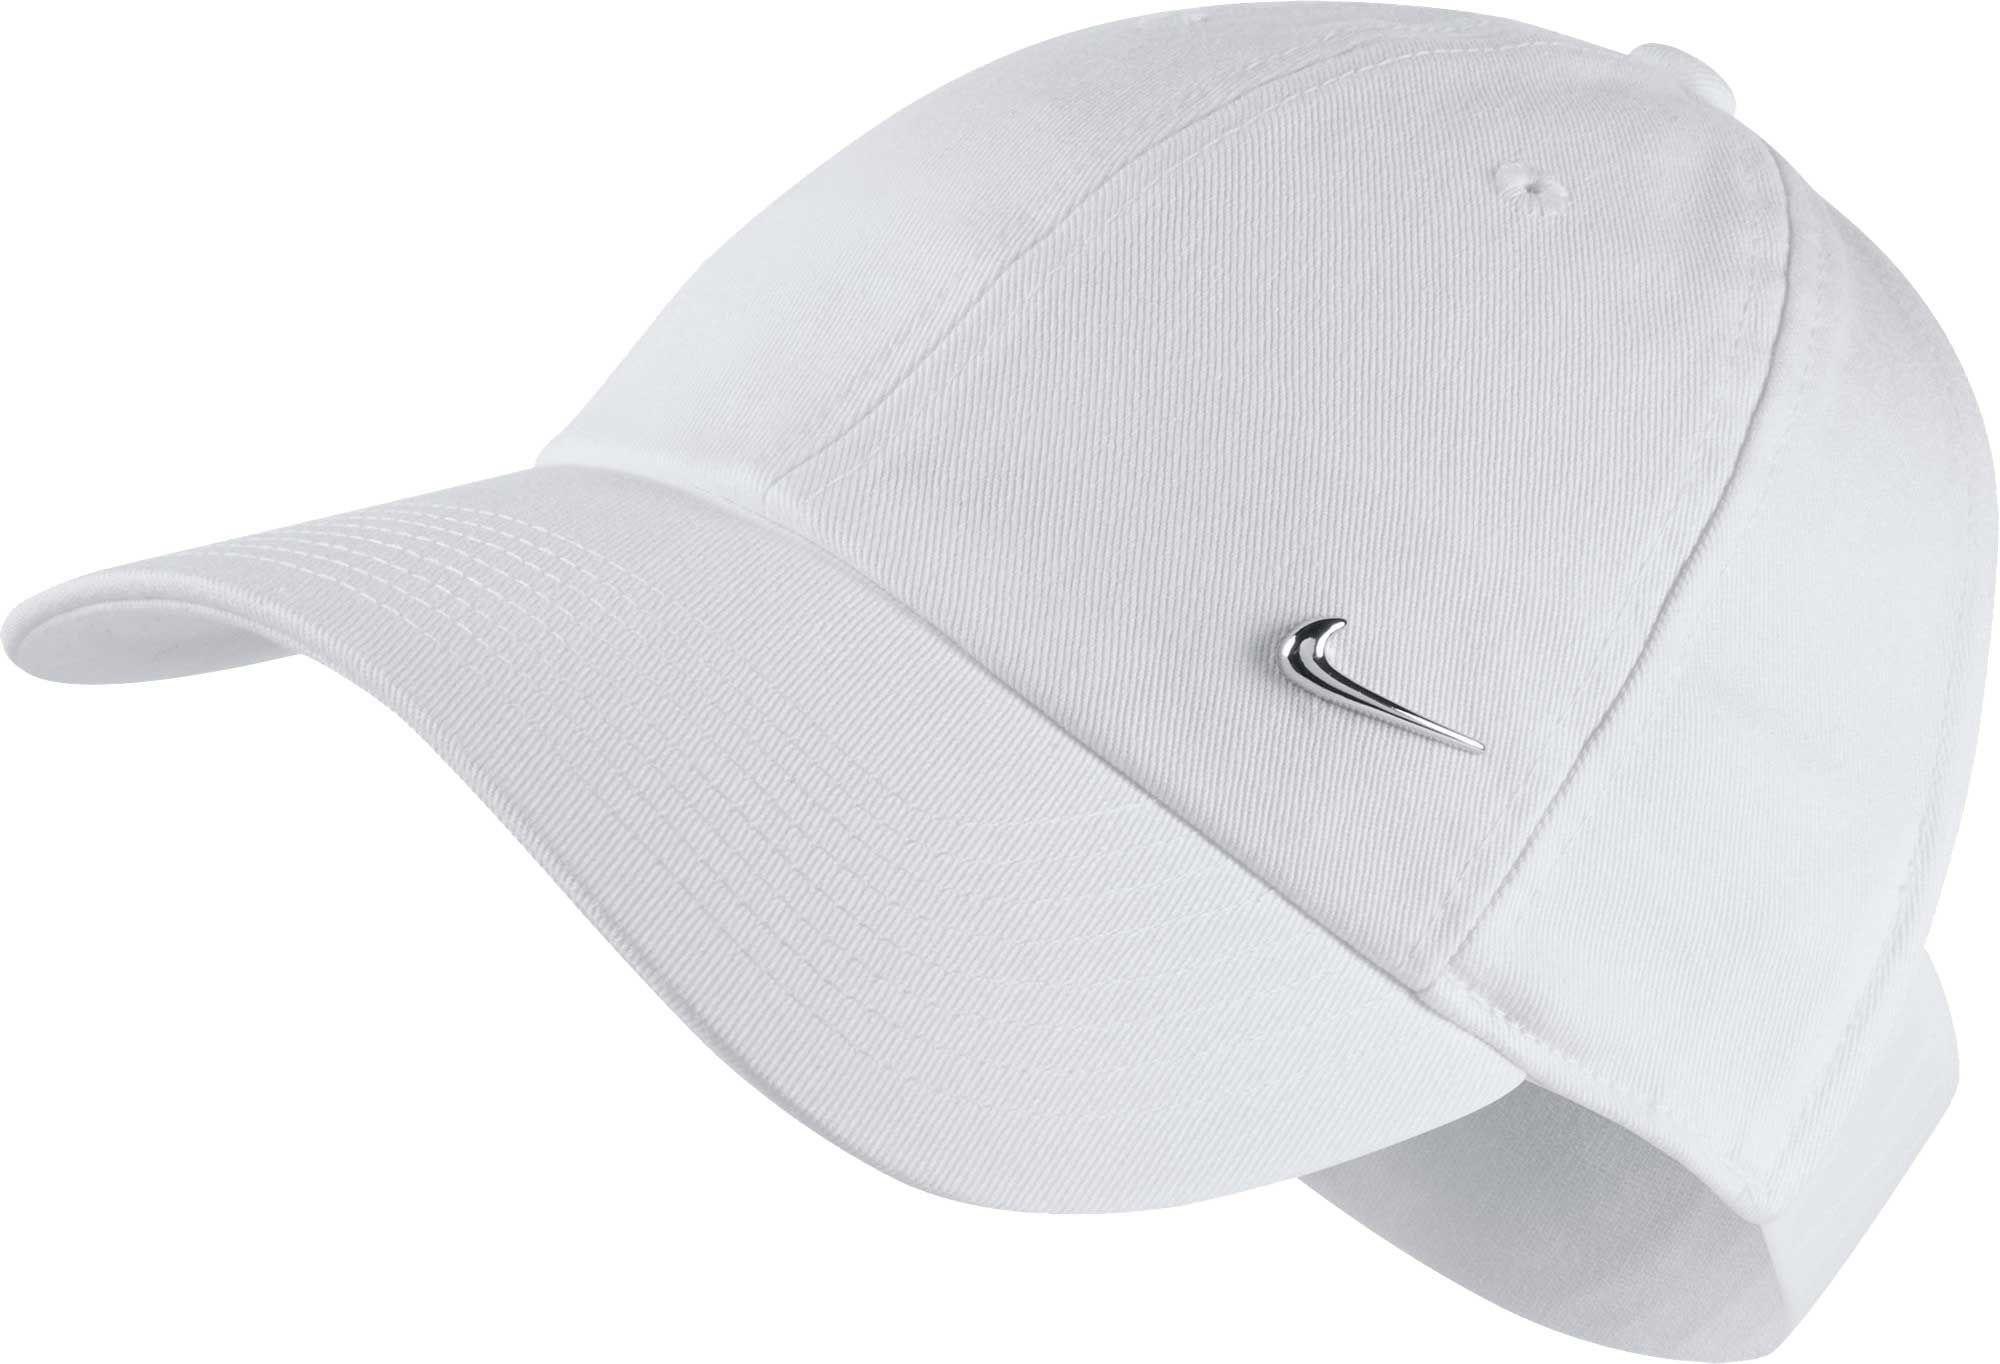 1793834a4773a ... new arrivals lyst nike sportswear open back visor hat in white 8d383  eda4c